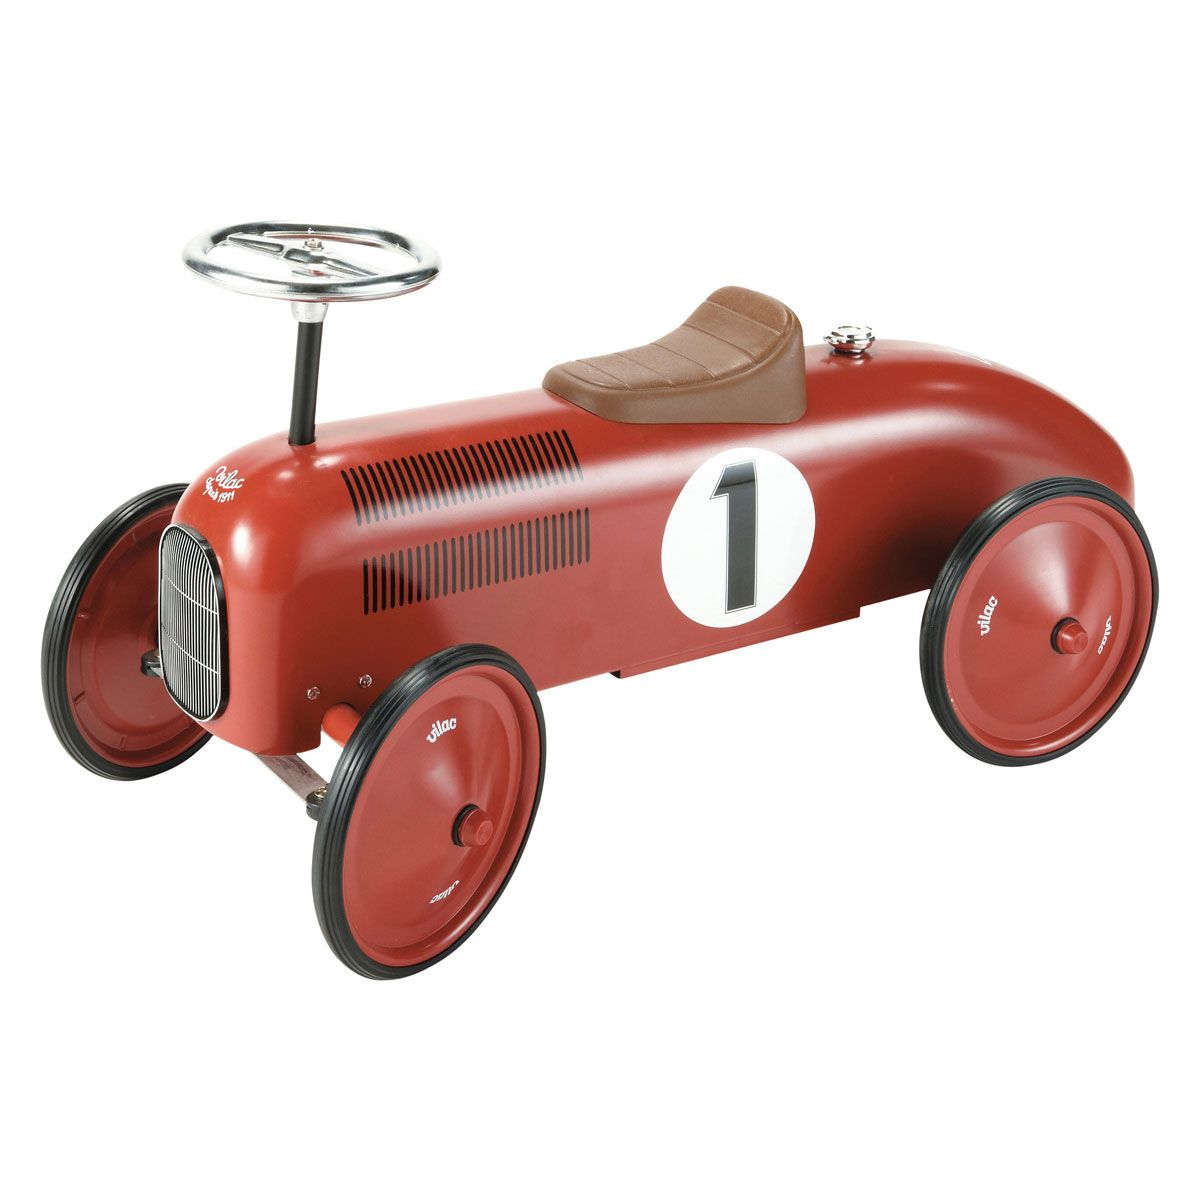 porteur voiture en m tal rouge kids room voiture porteur maison du monde voiture enfant. Black Bedroom Furniture Sets. Home Design Ideas